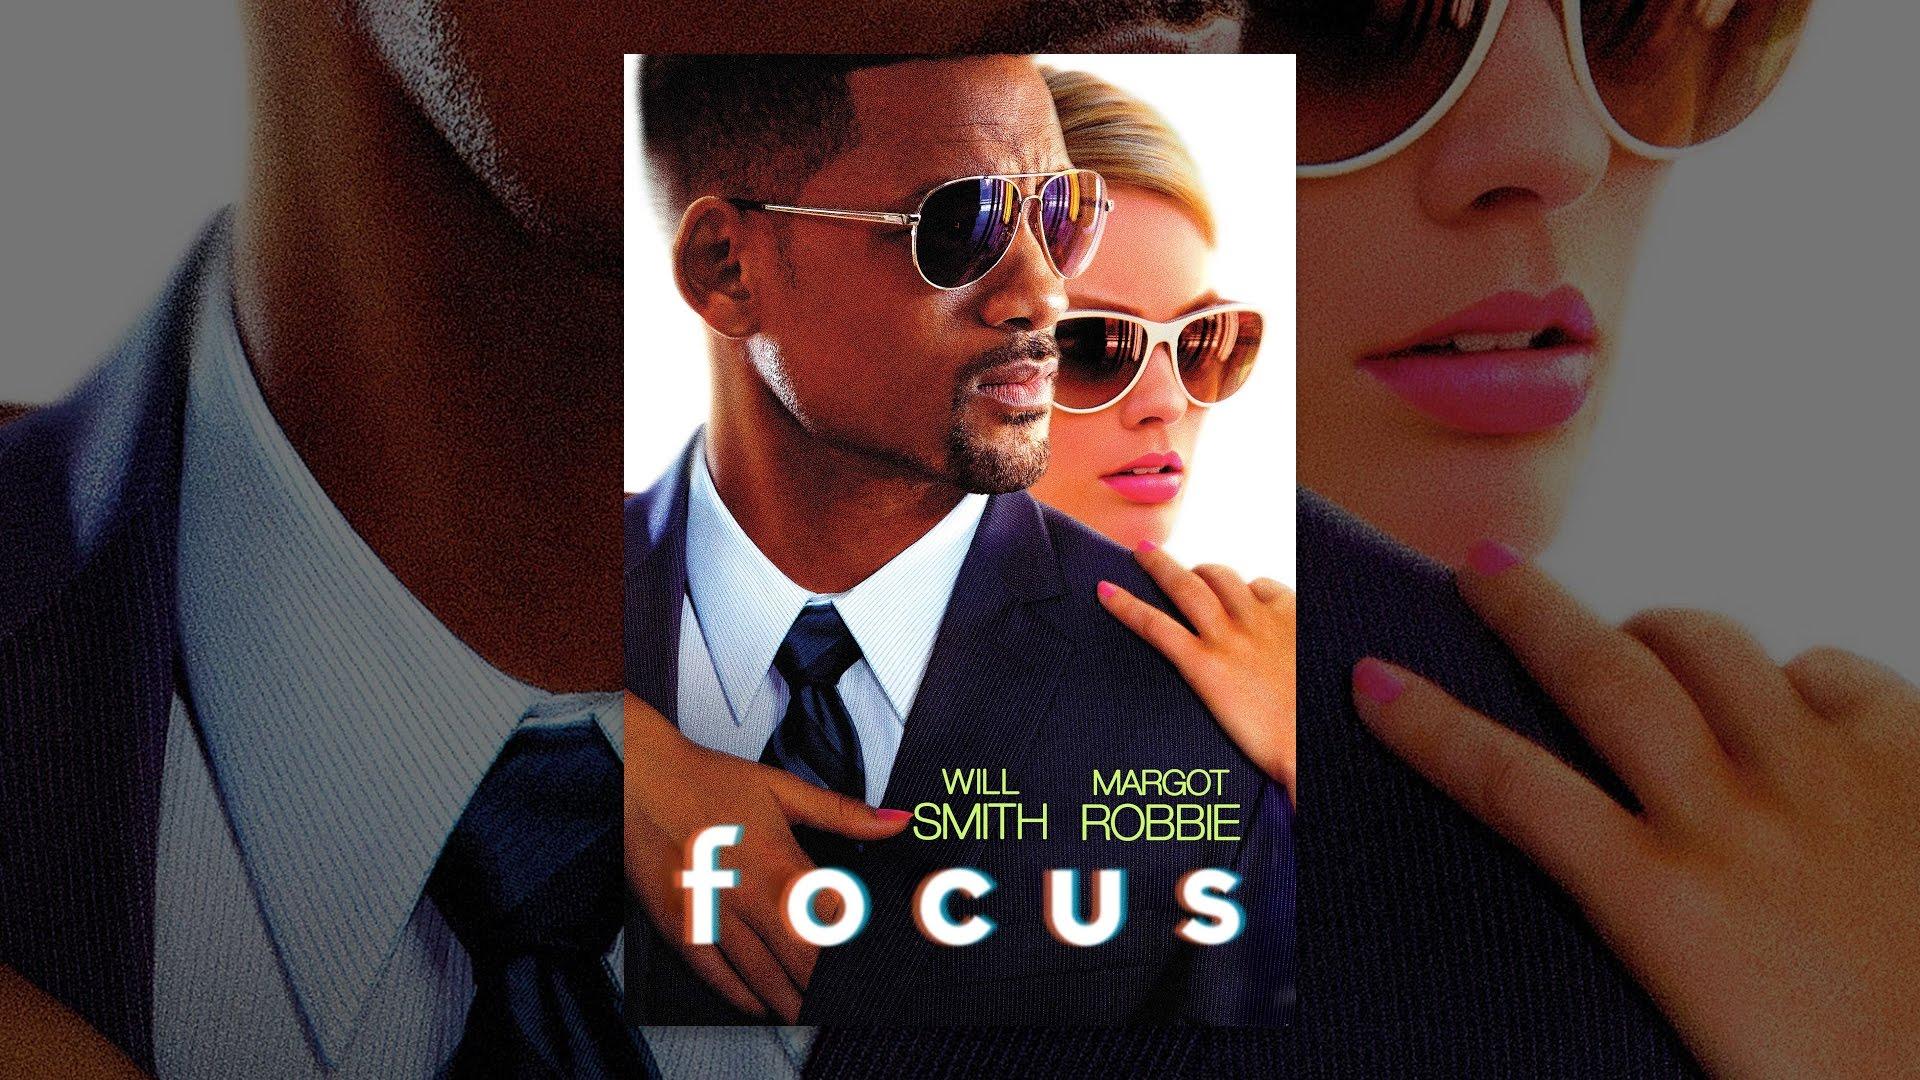 Download Focus (2015)